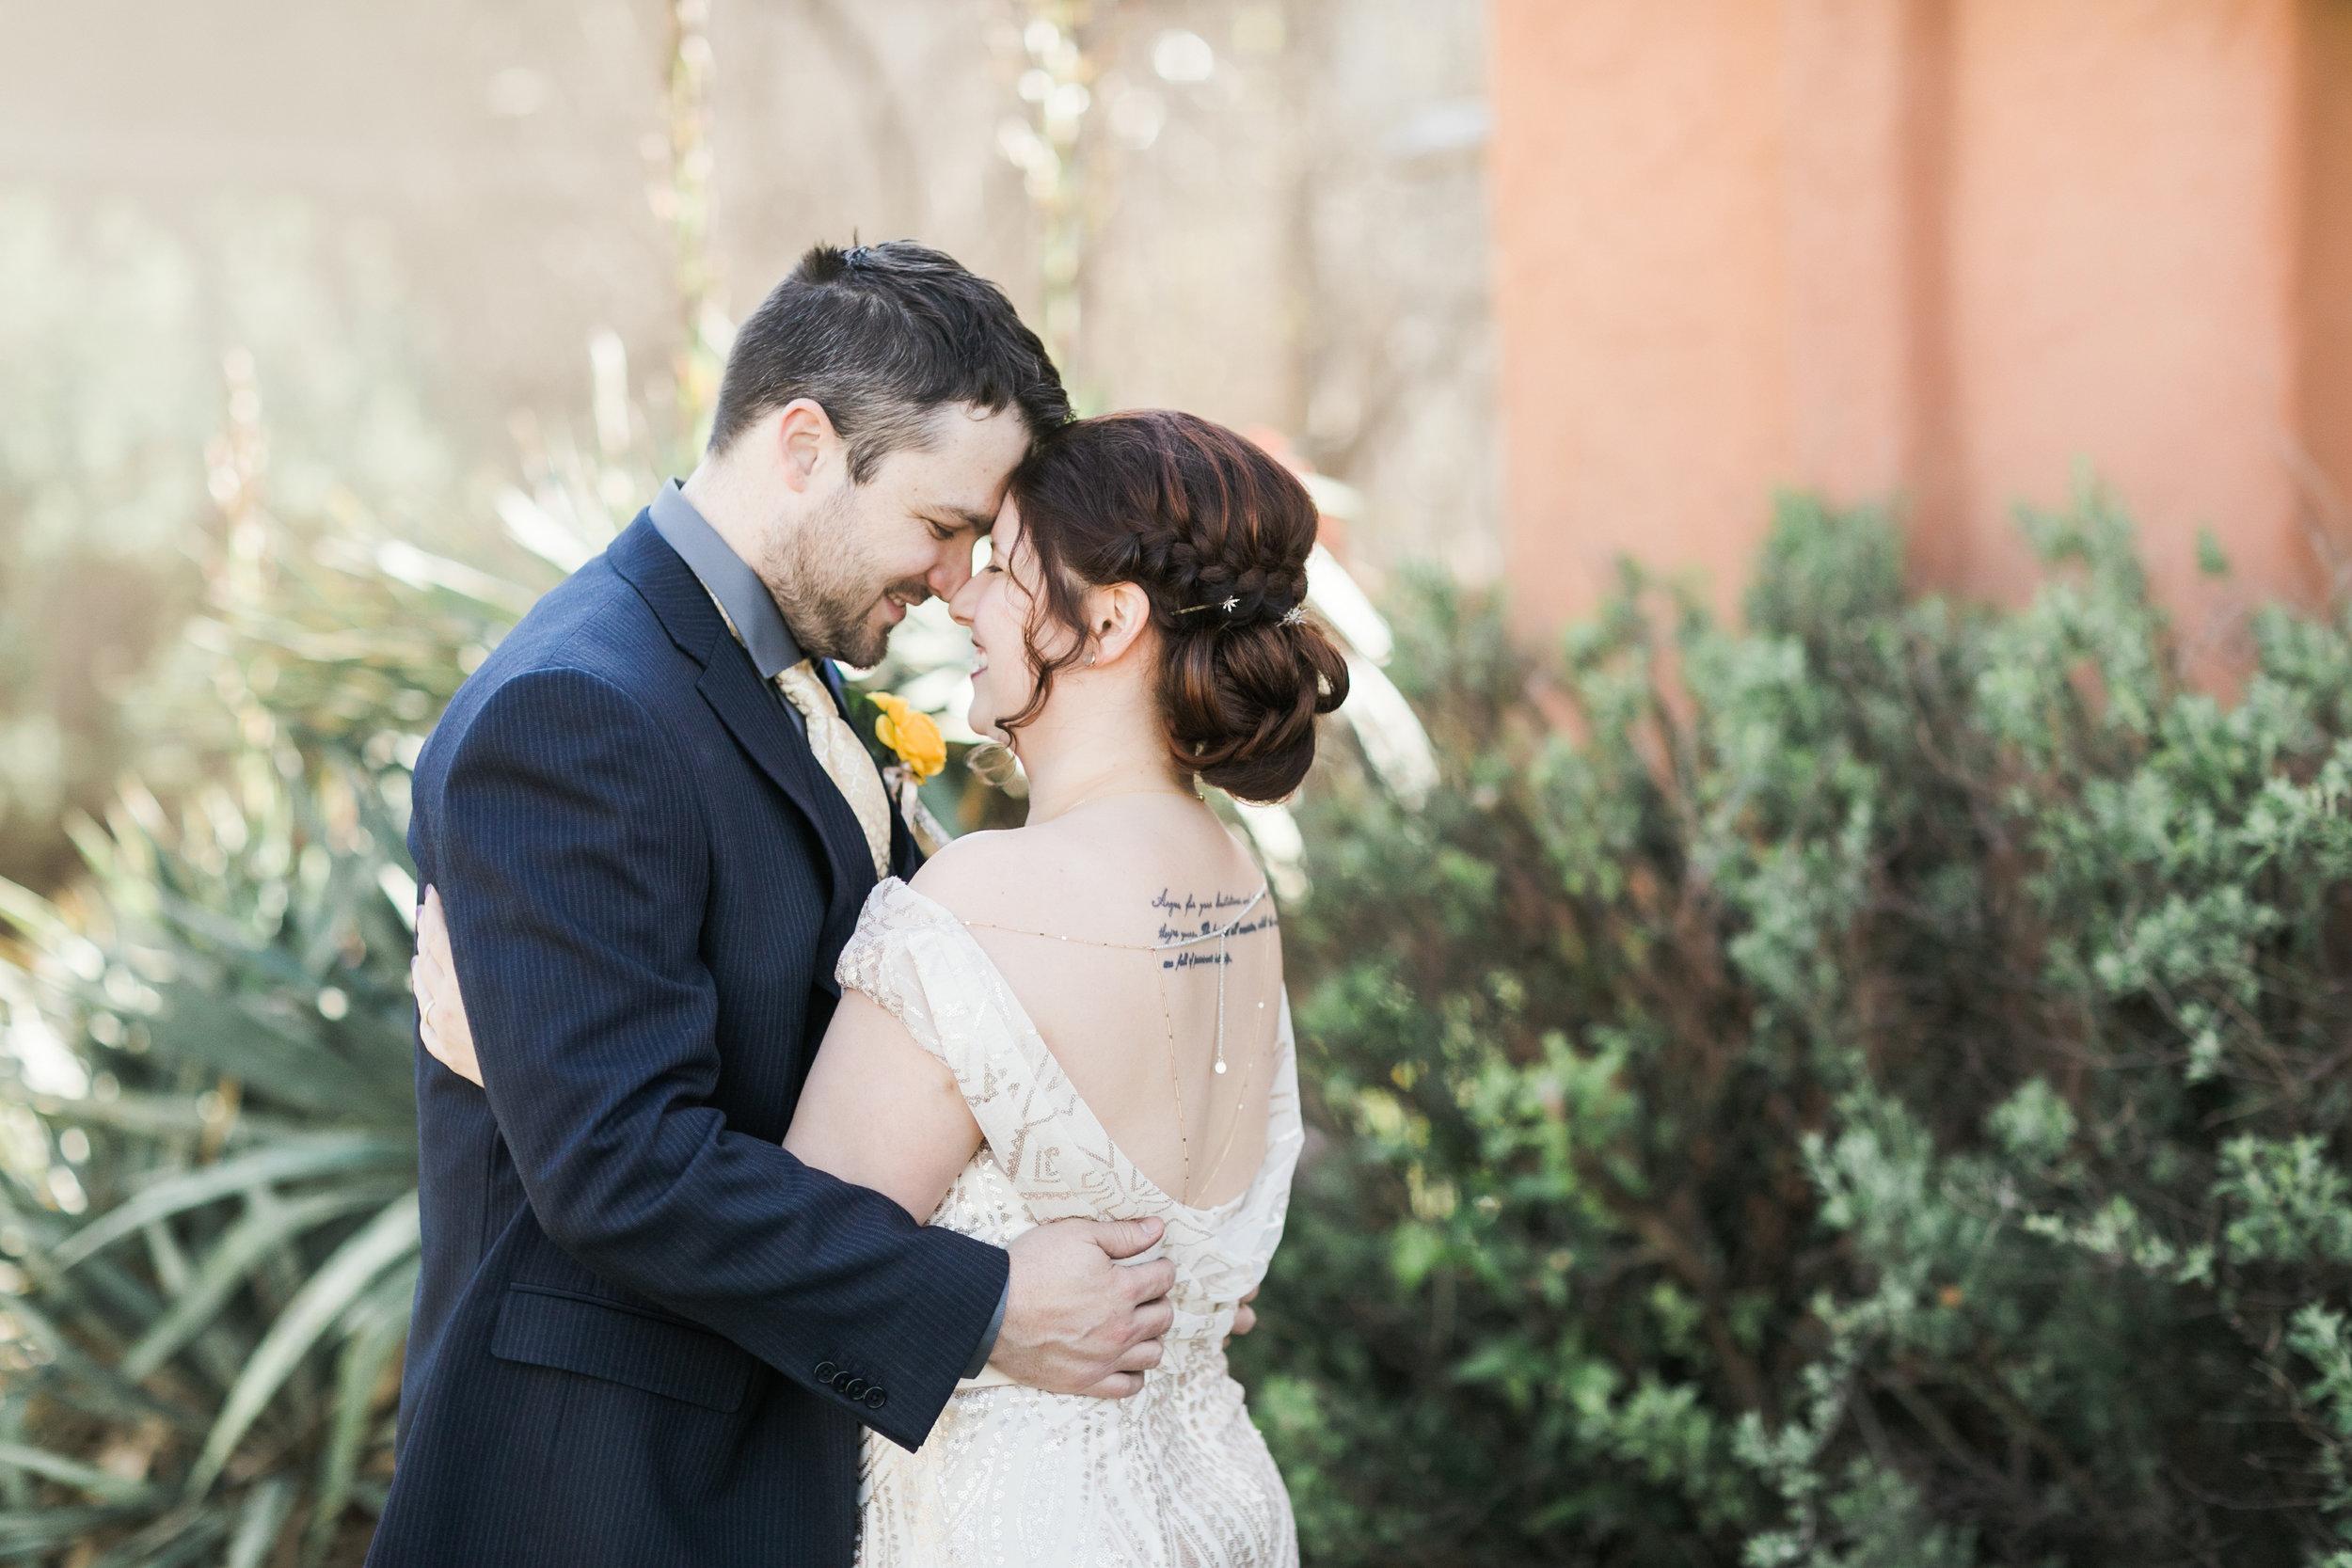 the-rock-barn-henrietta-wedding-photographer-texas-wichita-falls-earth-day-wedding-010.jpg